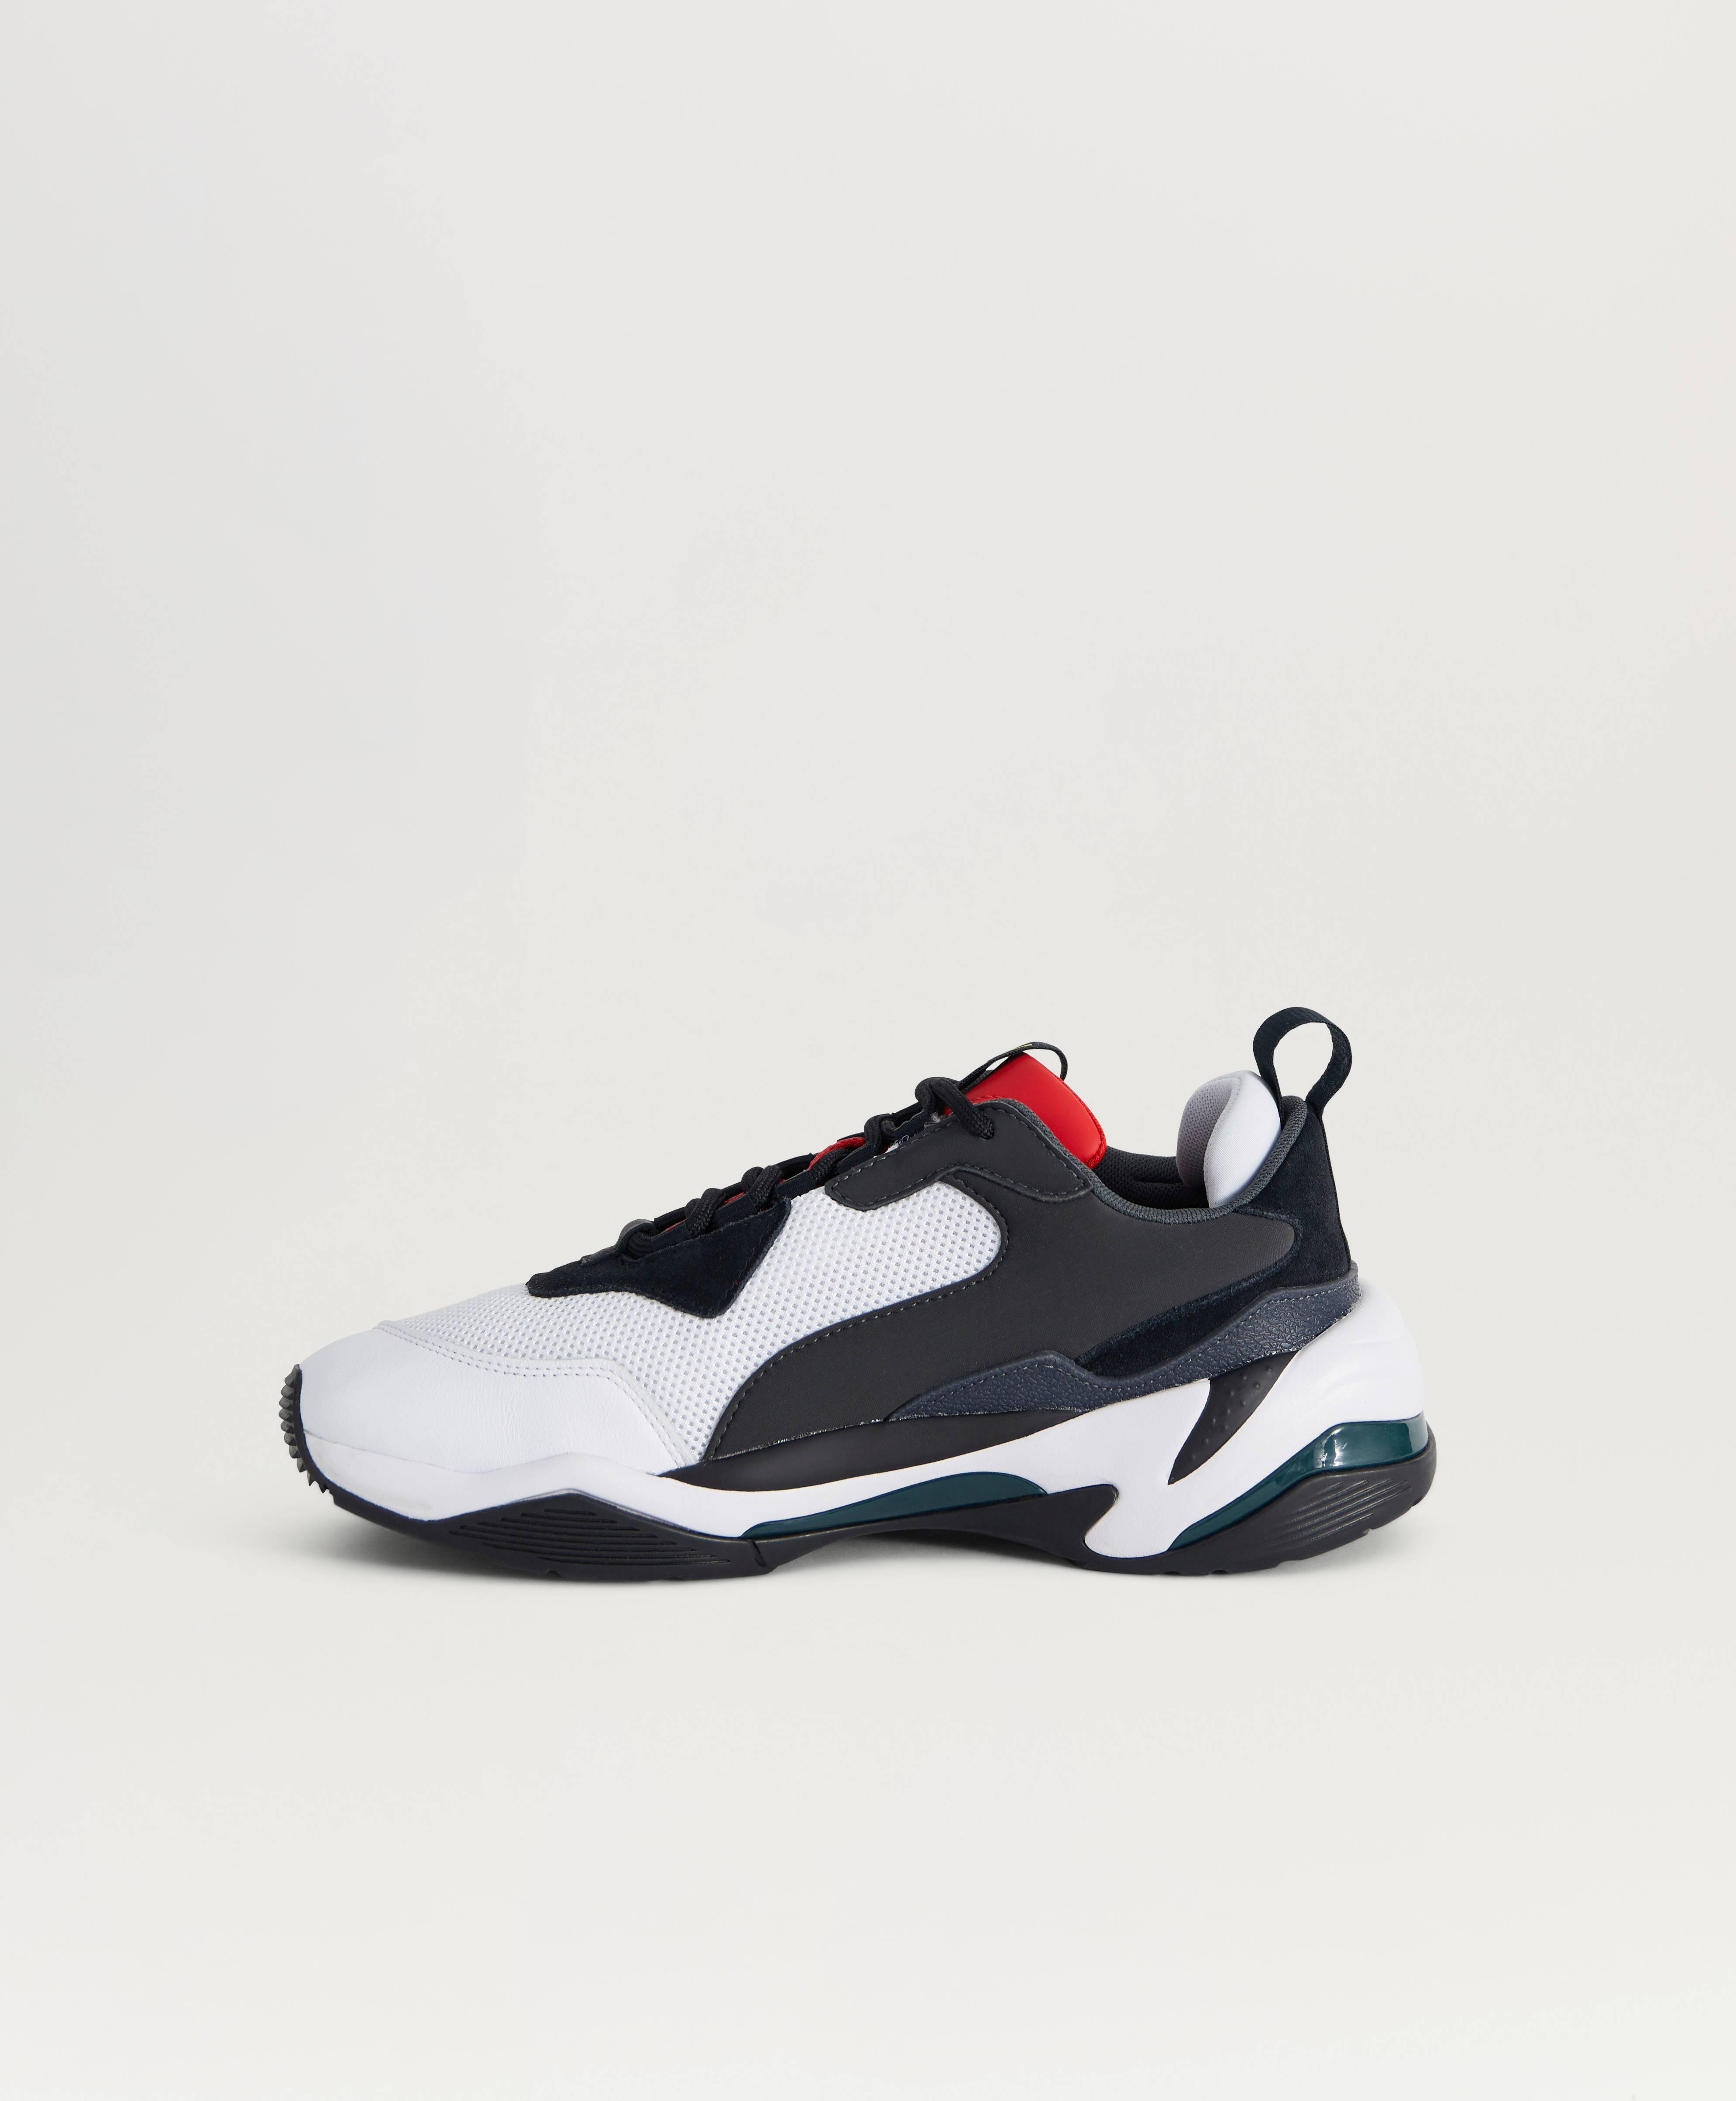 Puma Sneakers Thunder Spectra Puma Black High Risk Red